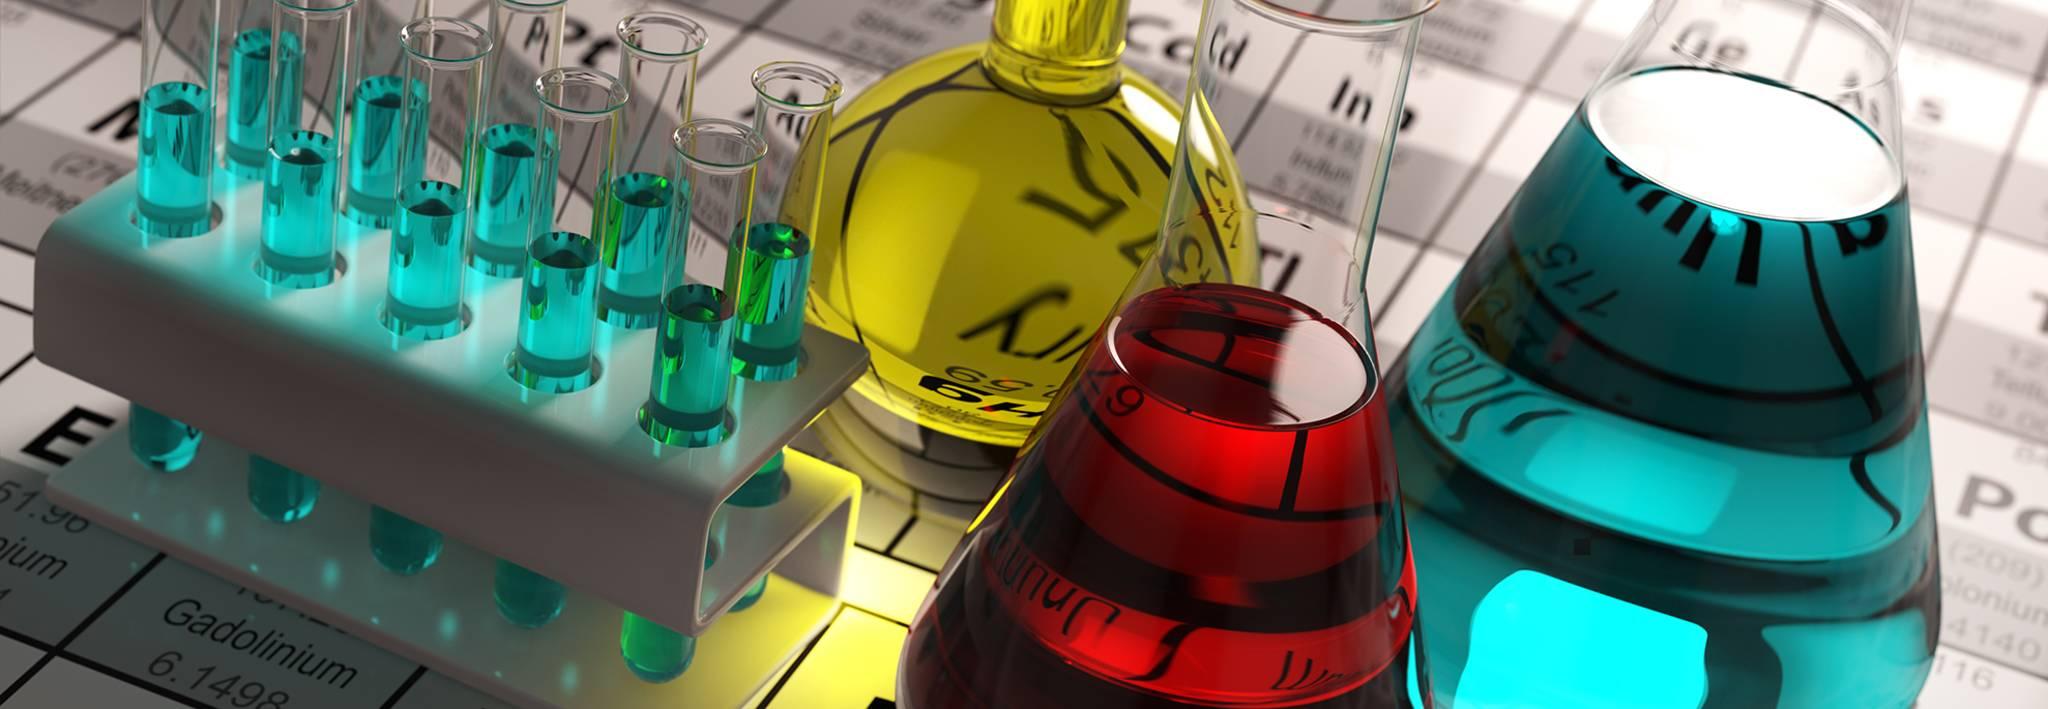 Colorado Christian University has an excellent chemistry program.